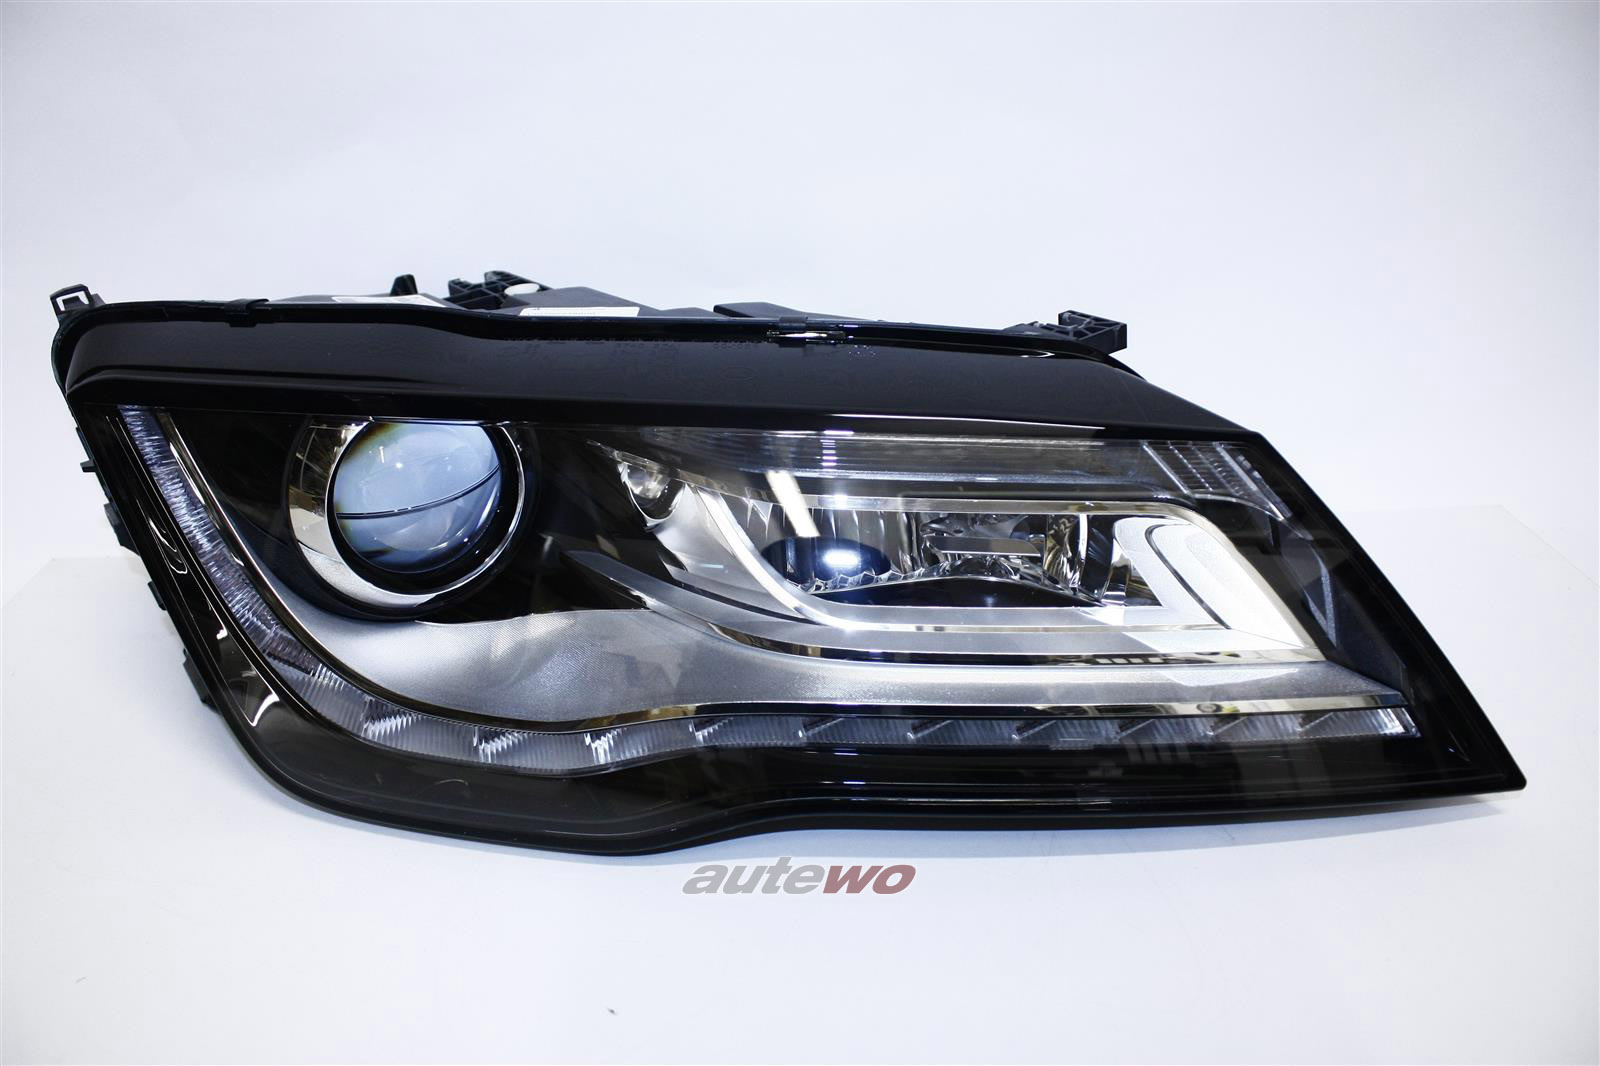 4G8941044B NEU&ORIGINAL Audi A7/RS7 Bi-Xenon Scheinwerfer US-Version Rechts